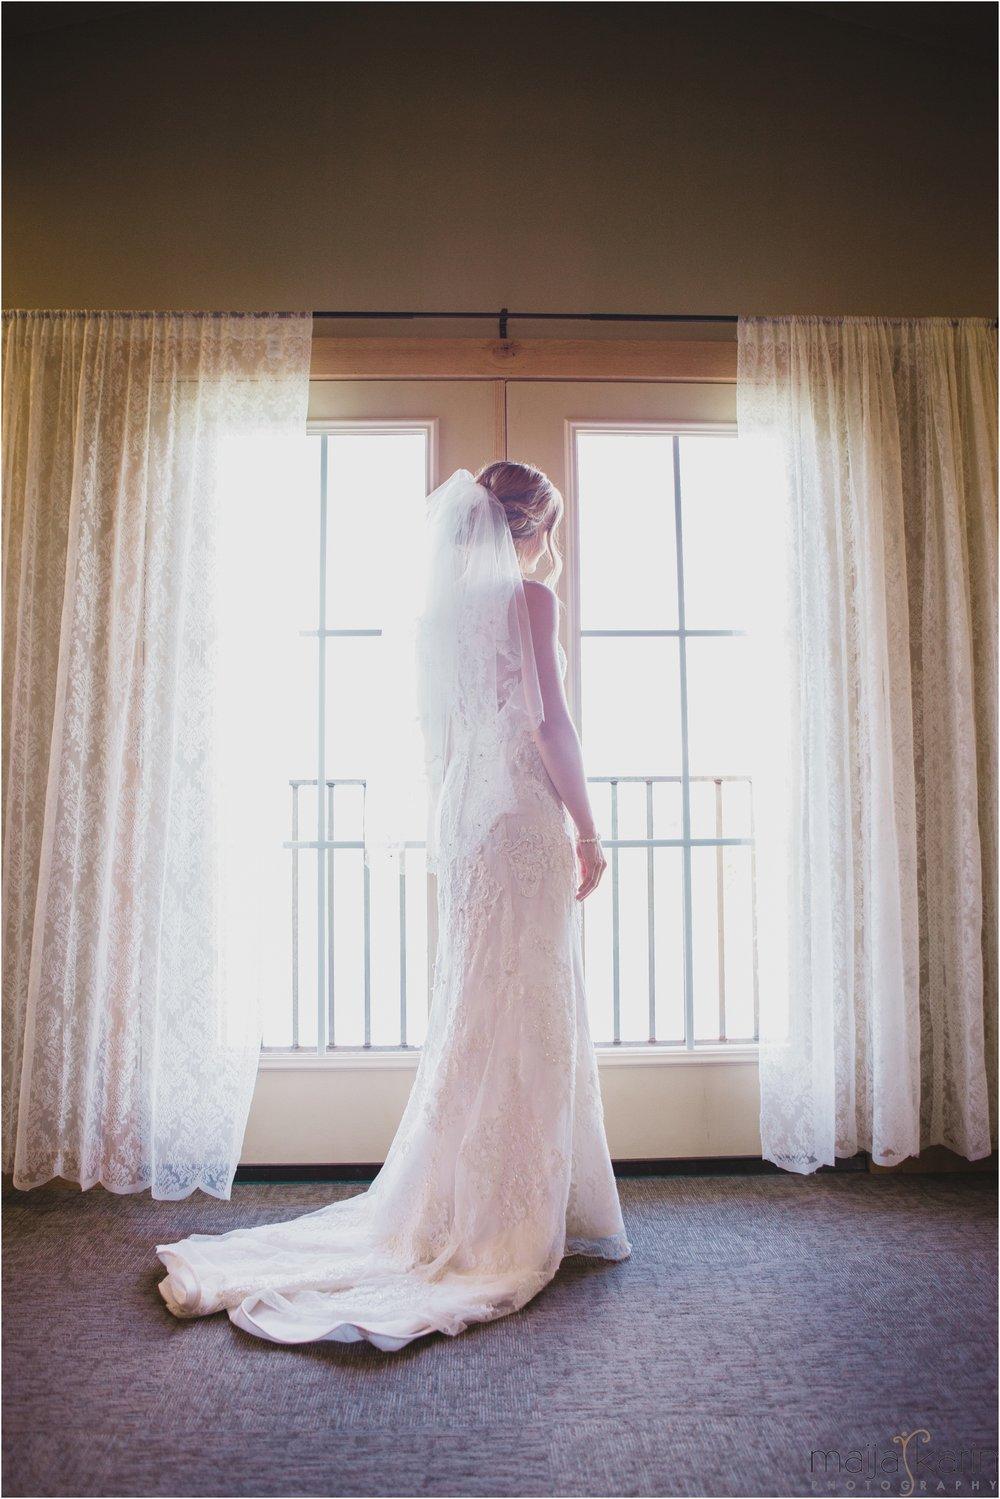 Stree-free-wedding-guide-maija-karin-photography31.jpg